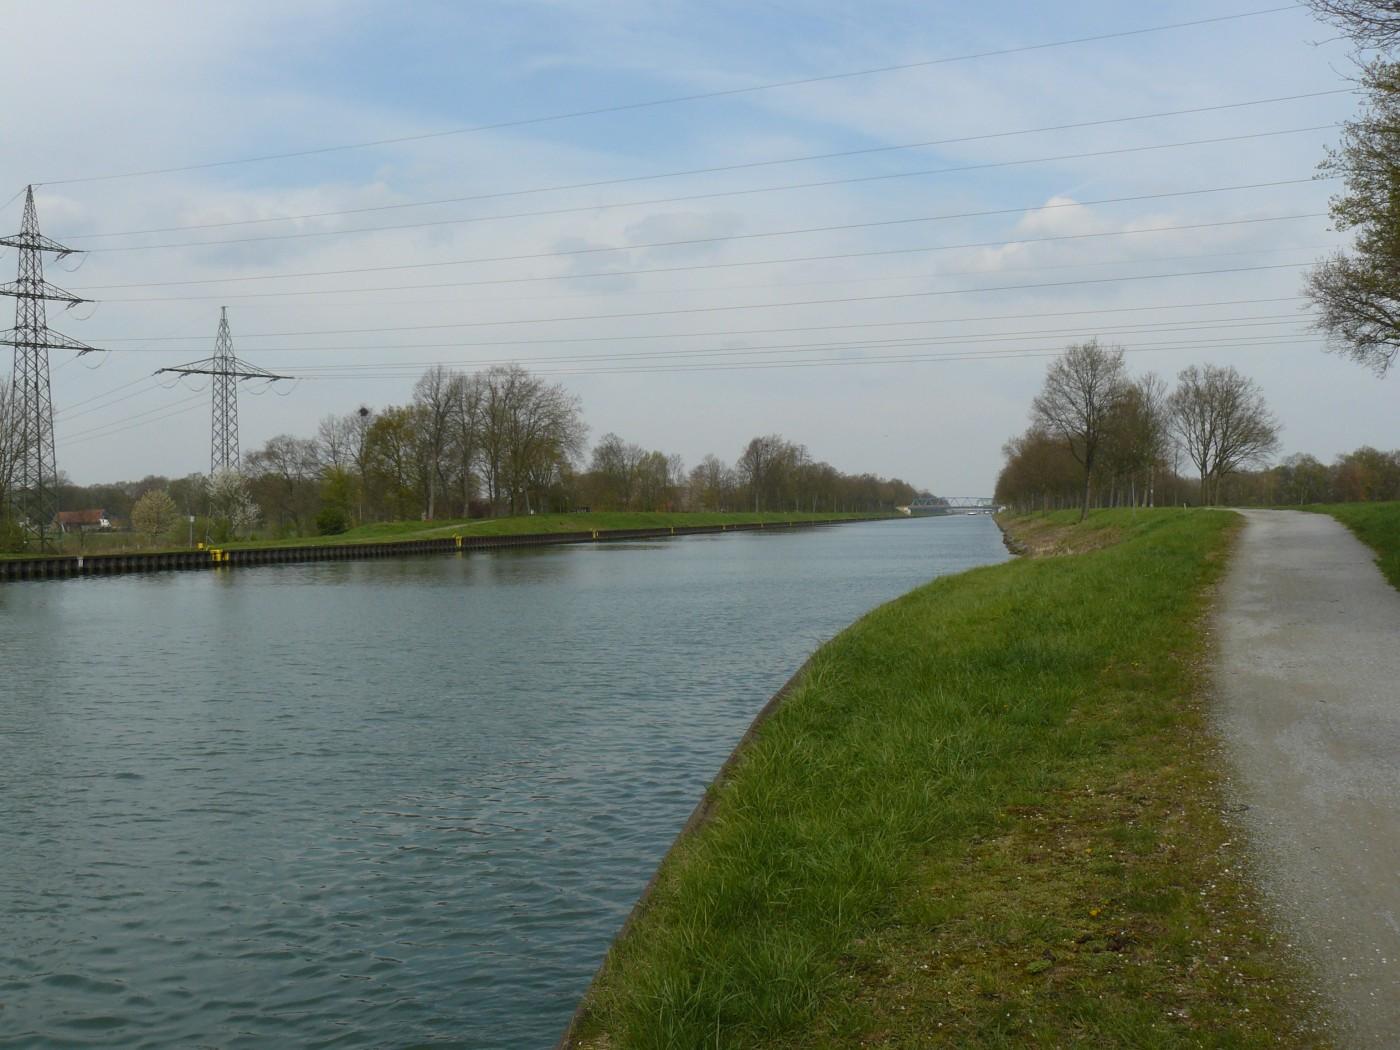 Der Wesel-Datteln-Kanal